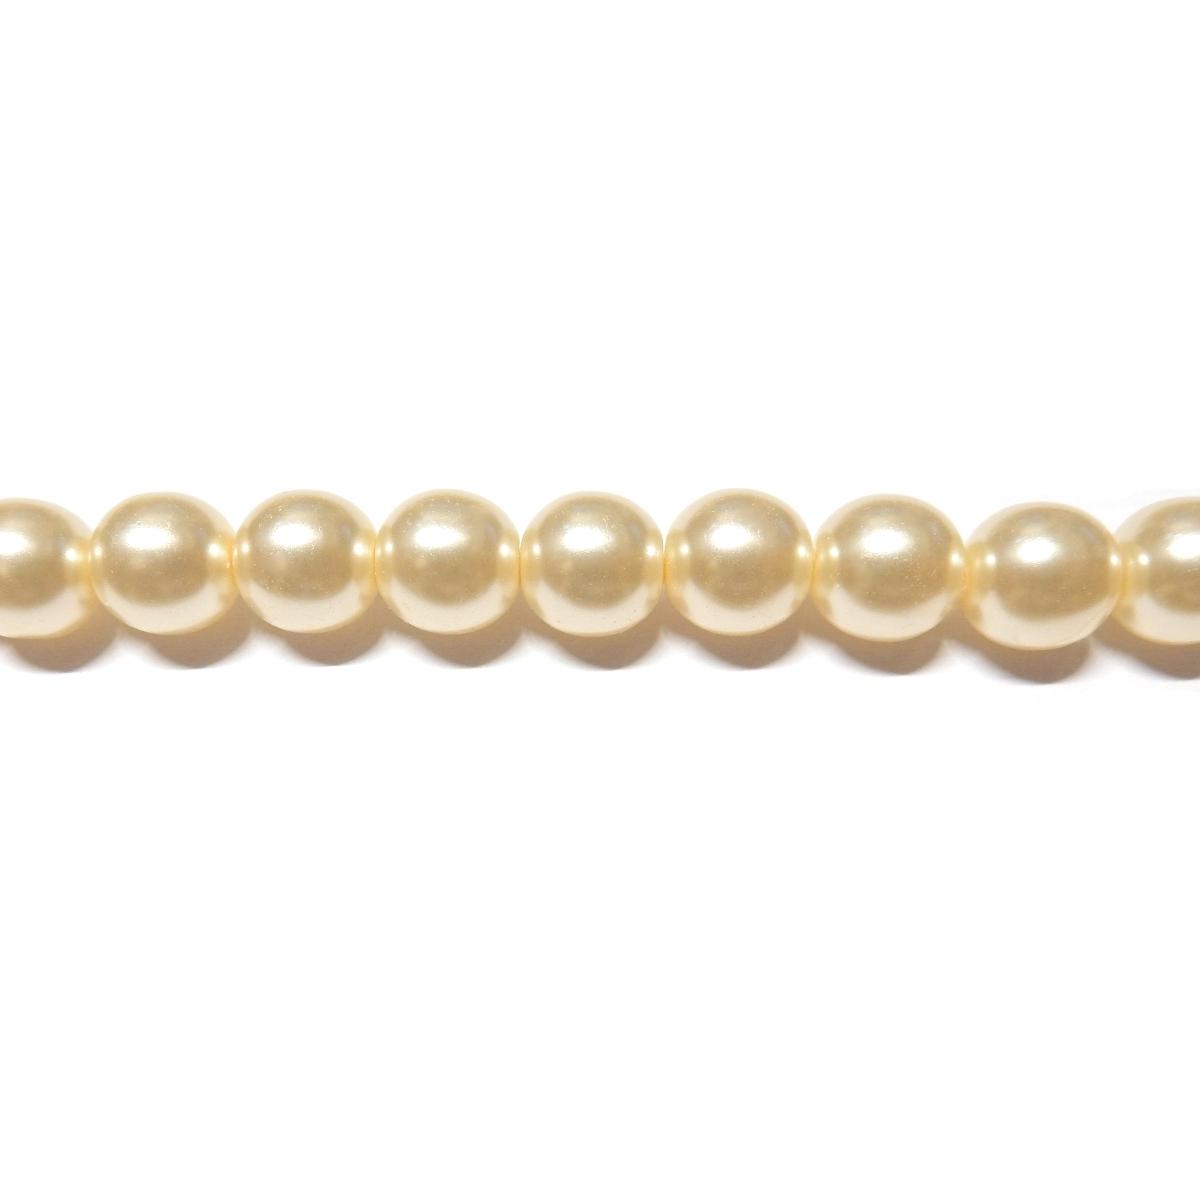 Round Glass Pearls 7mm - Cream Colour